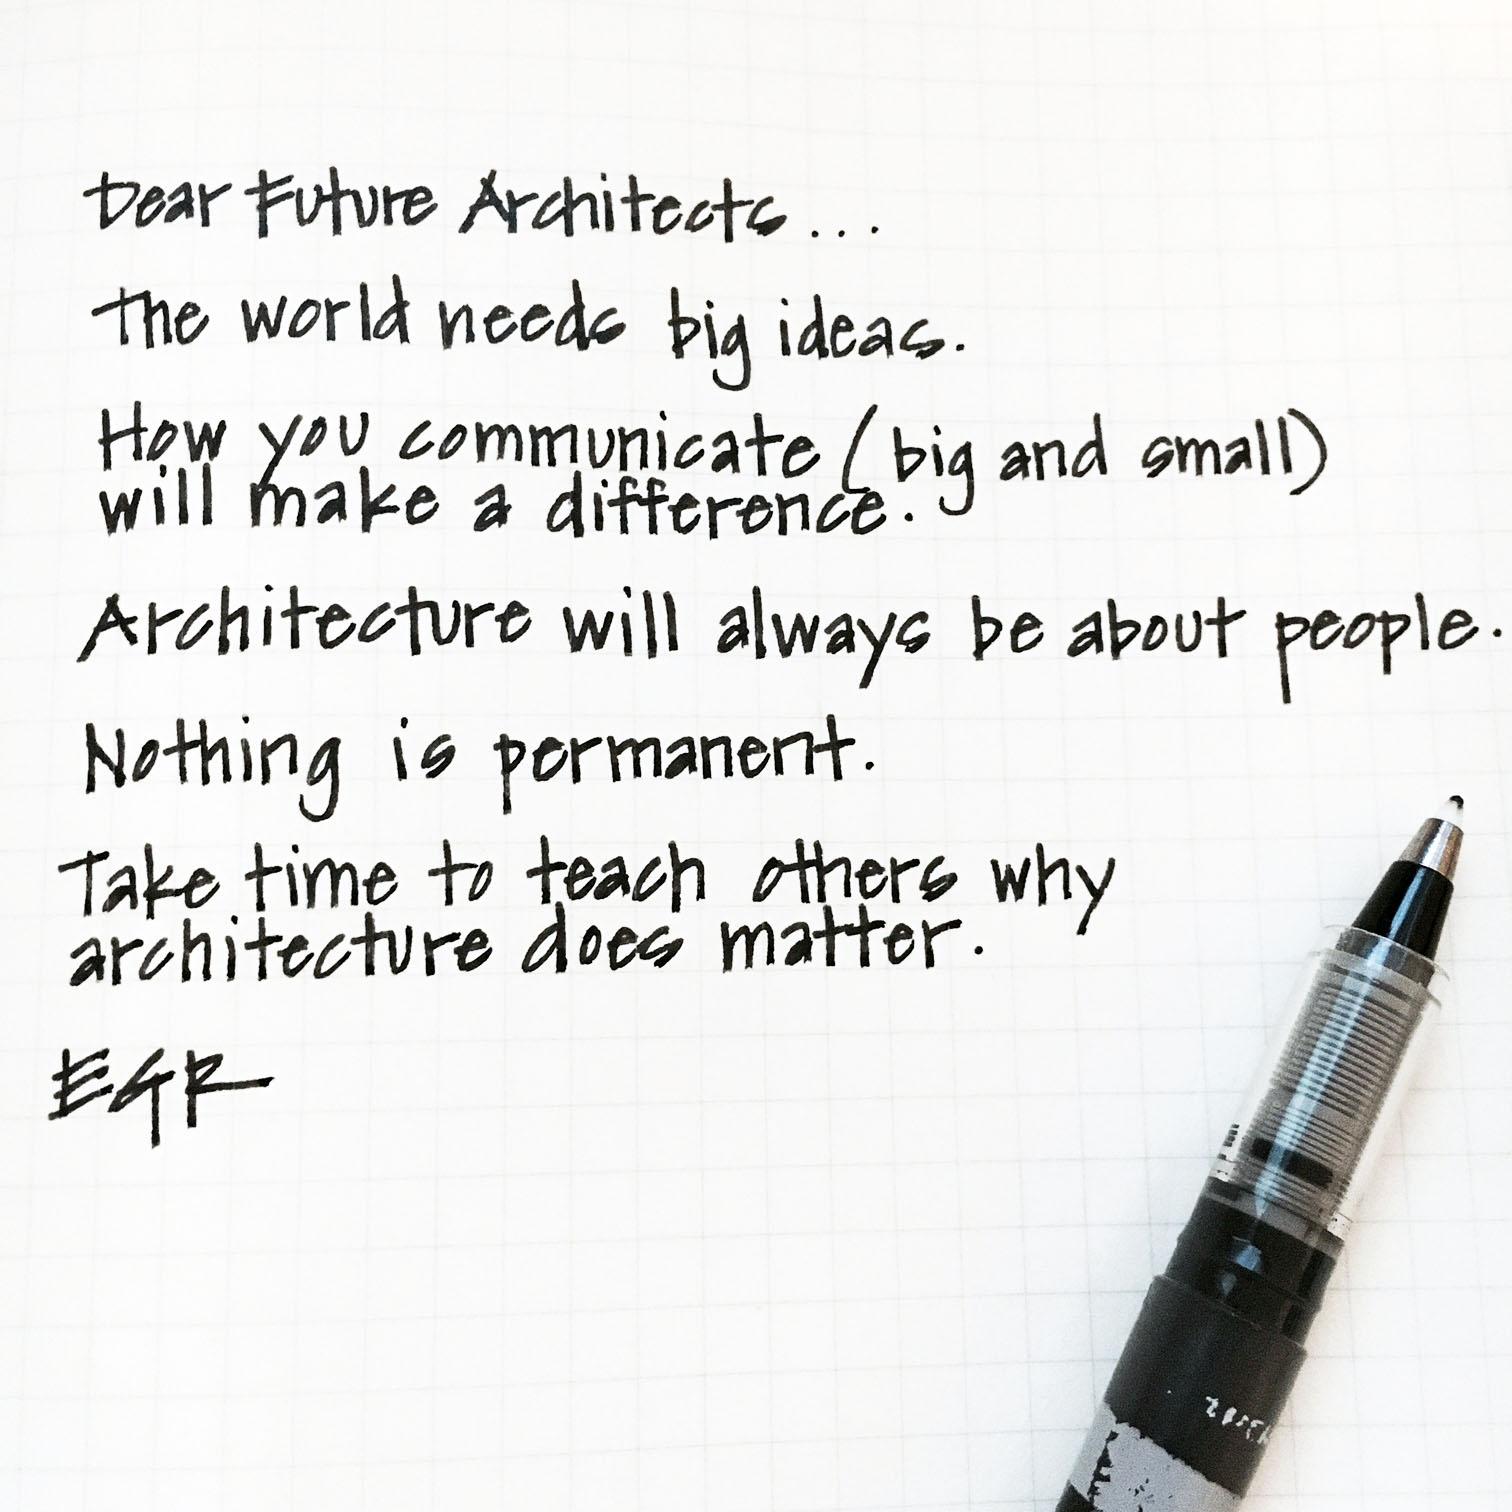 Dear Future Architects